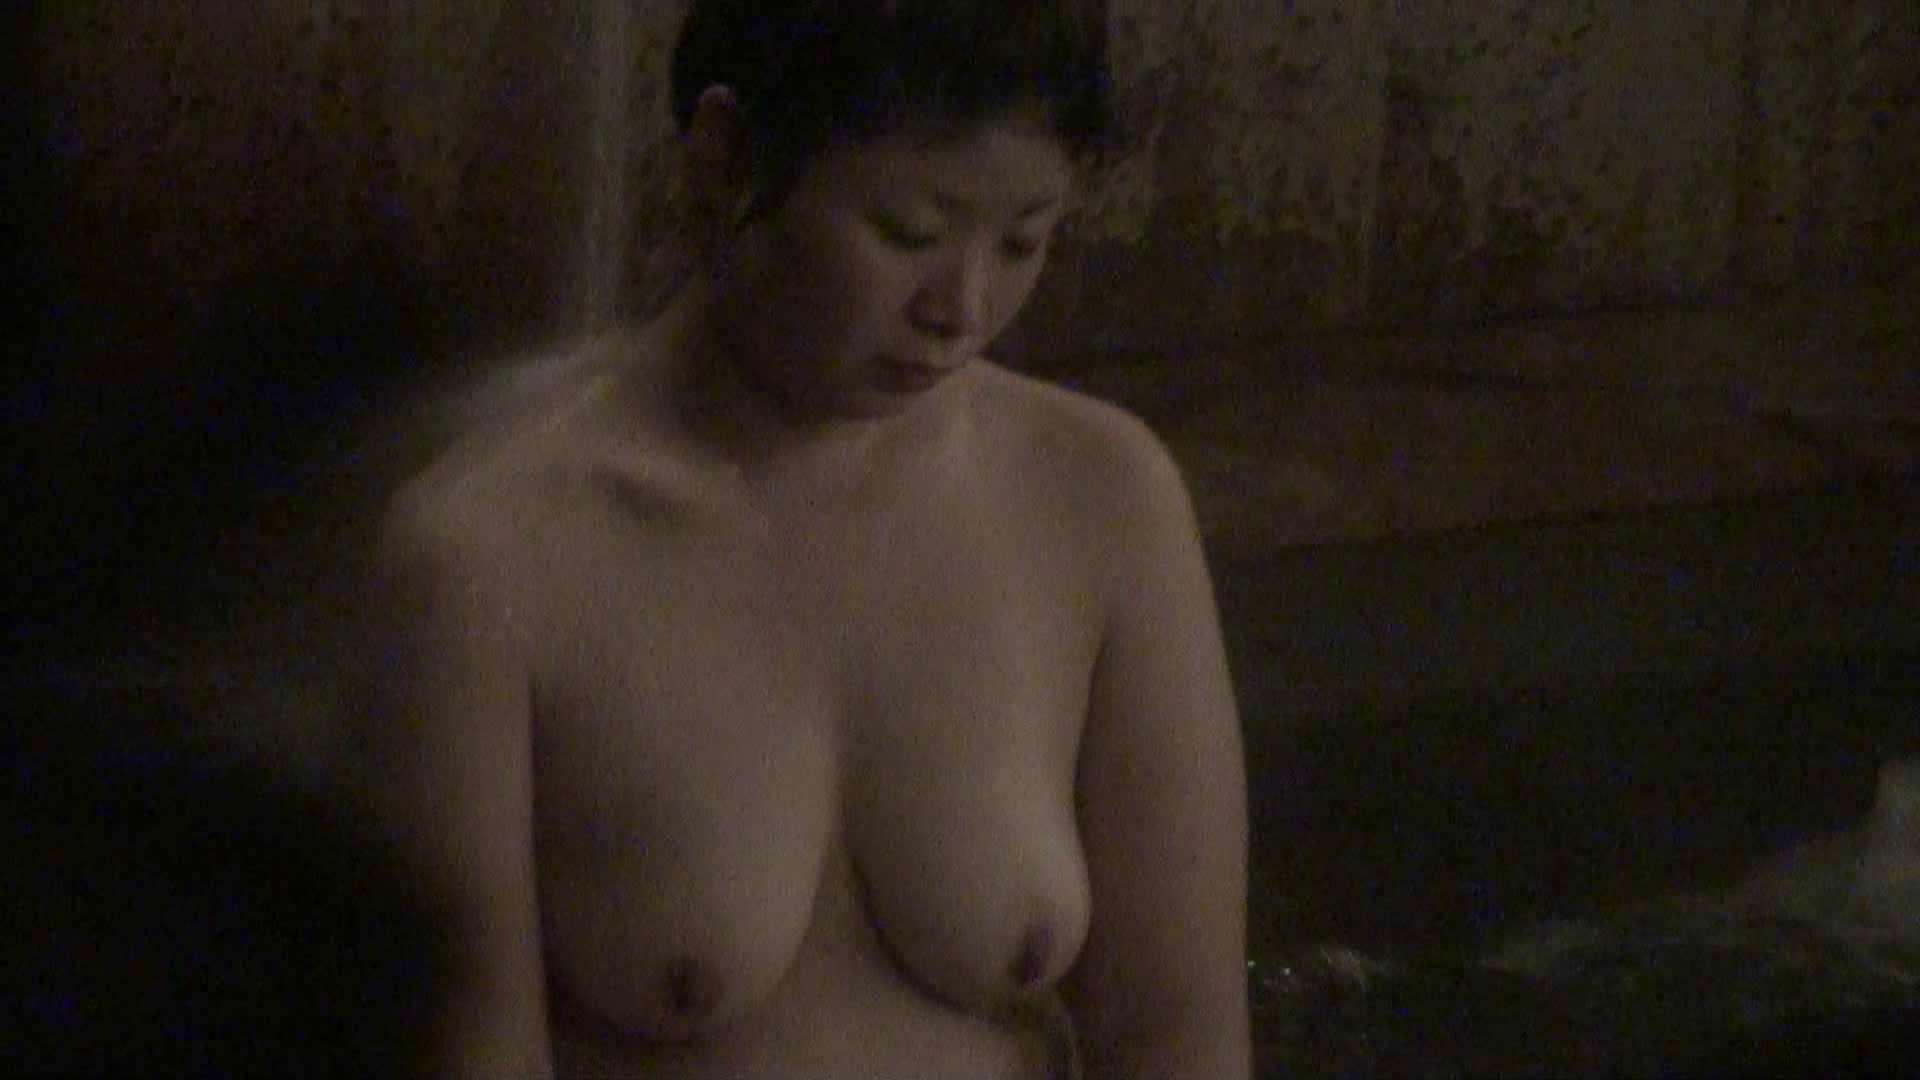 Aquaな露天風呂Vol.377 野外 SEX無修正画像 111PIX 51